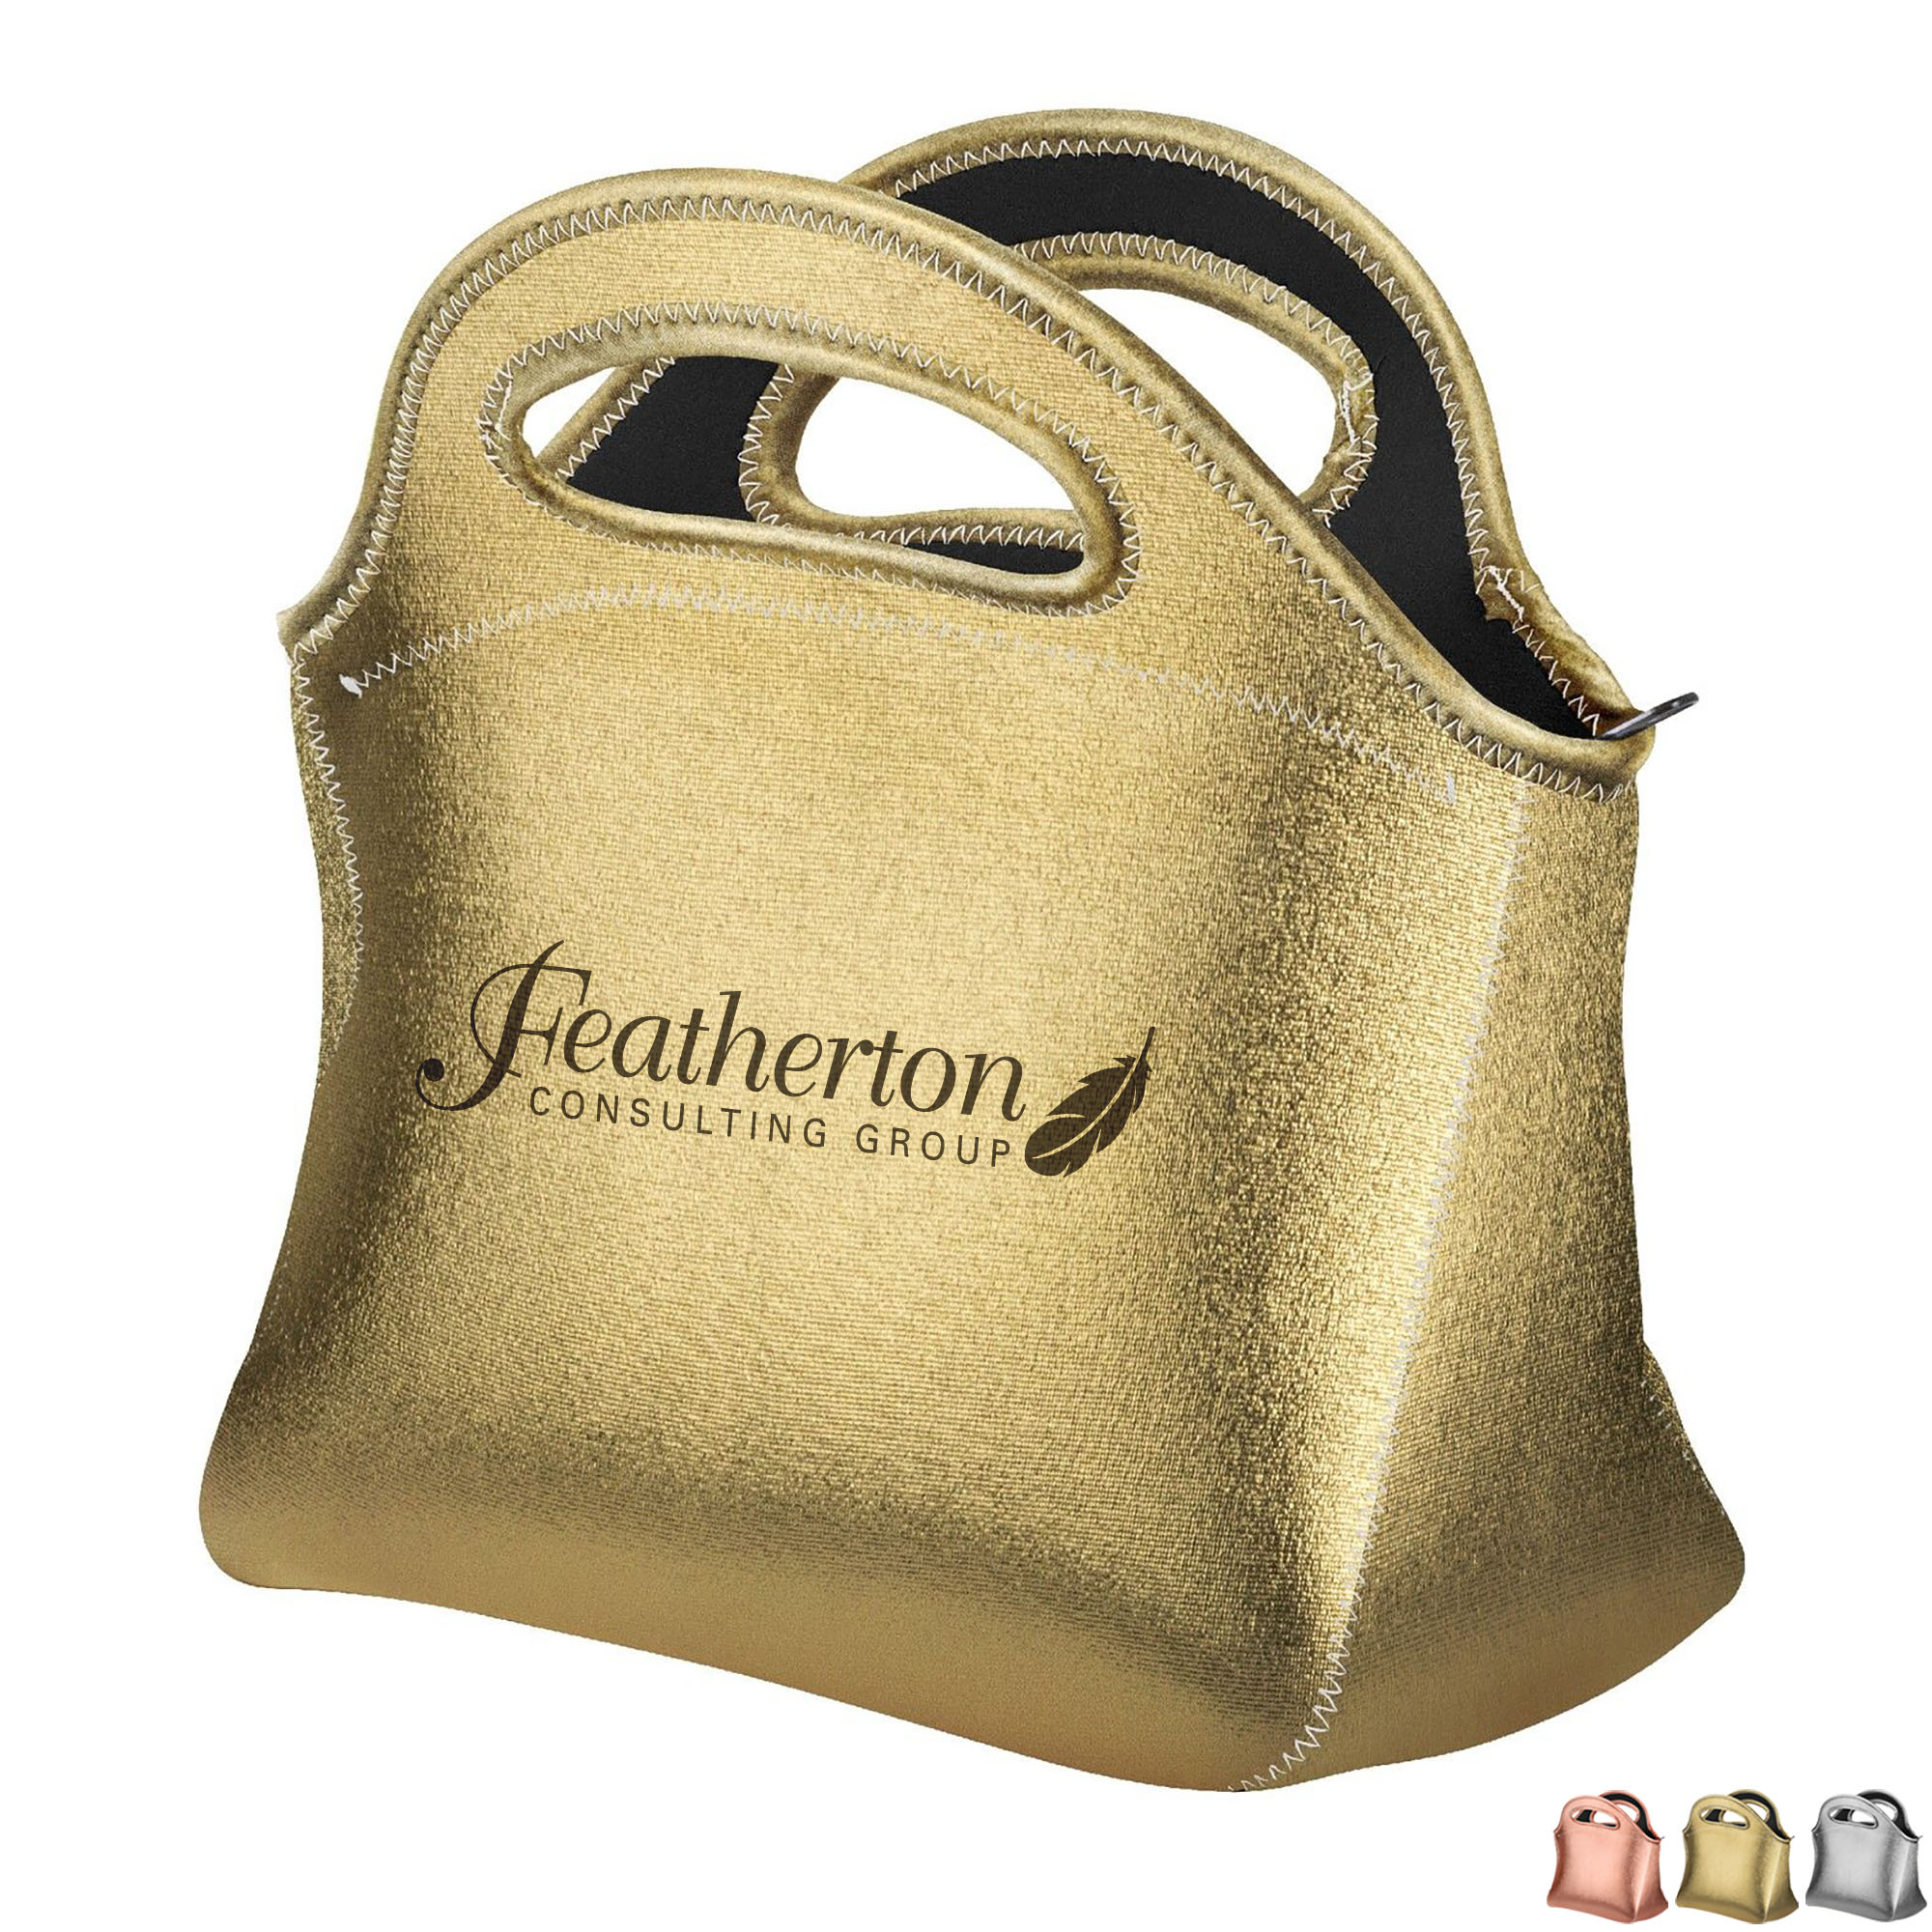 Gran Klutch Metallic Neonprene Lunch Bag